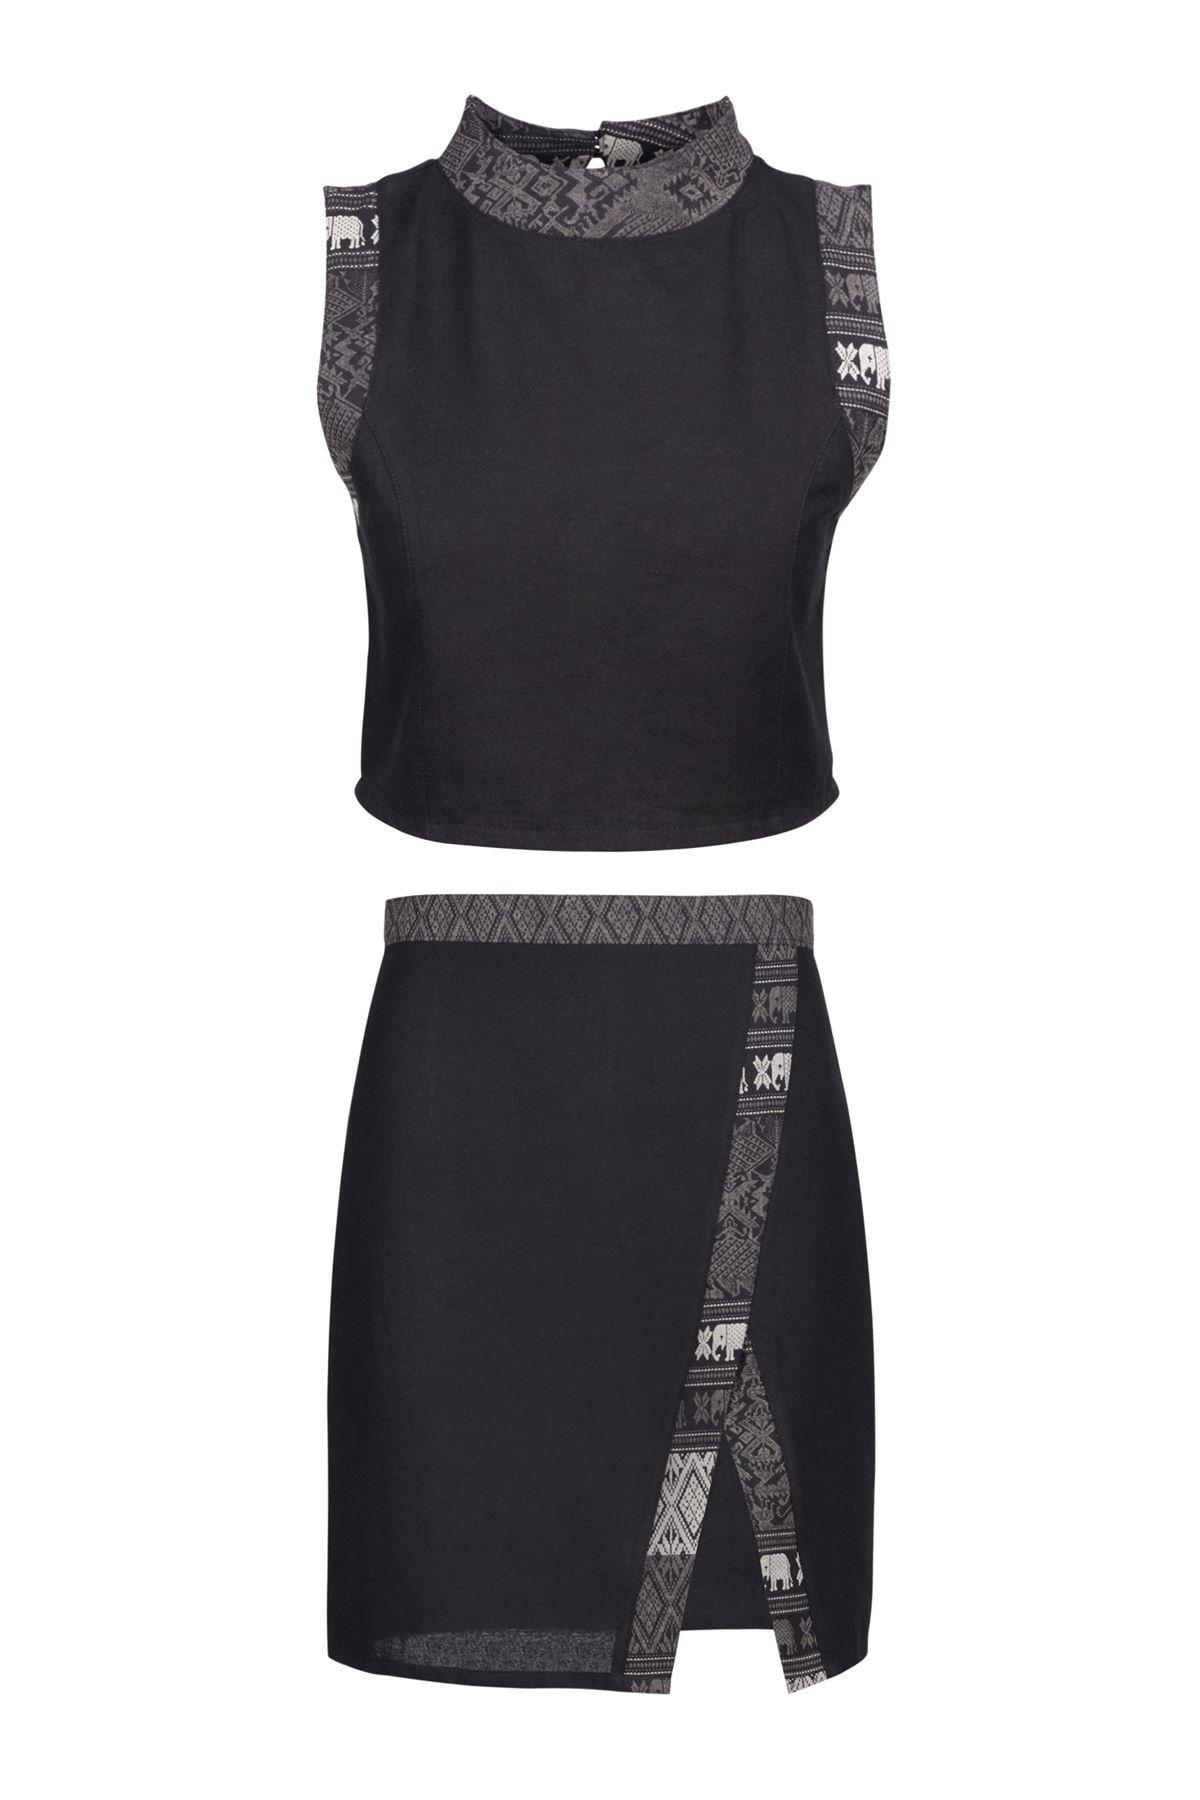 Lofbaz Women's Thai Cotton Top and Skirt Set Solid Black S